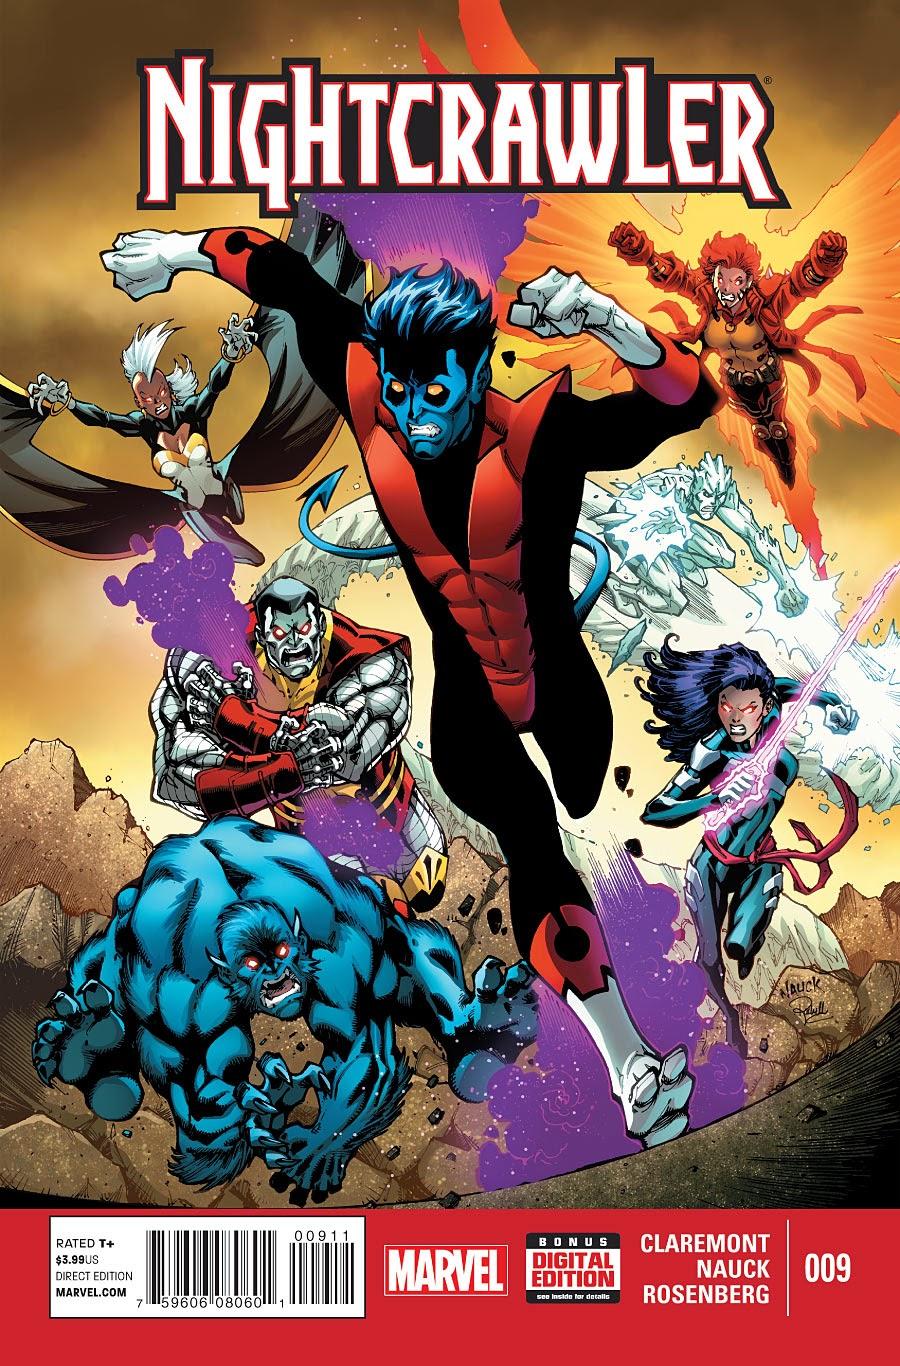 Nightcrawler out bampfs the X-Men